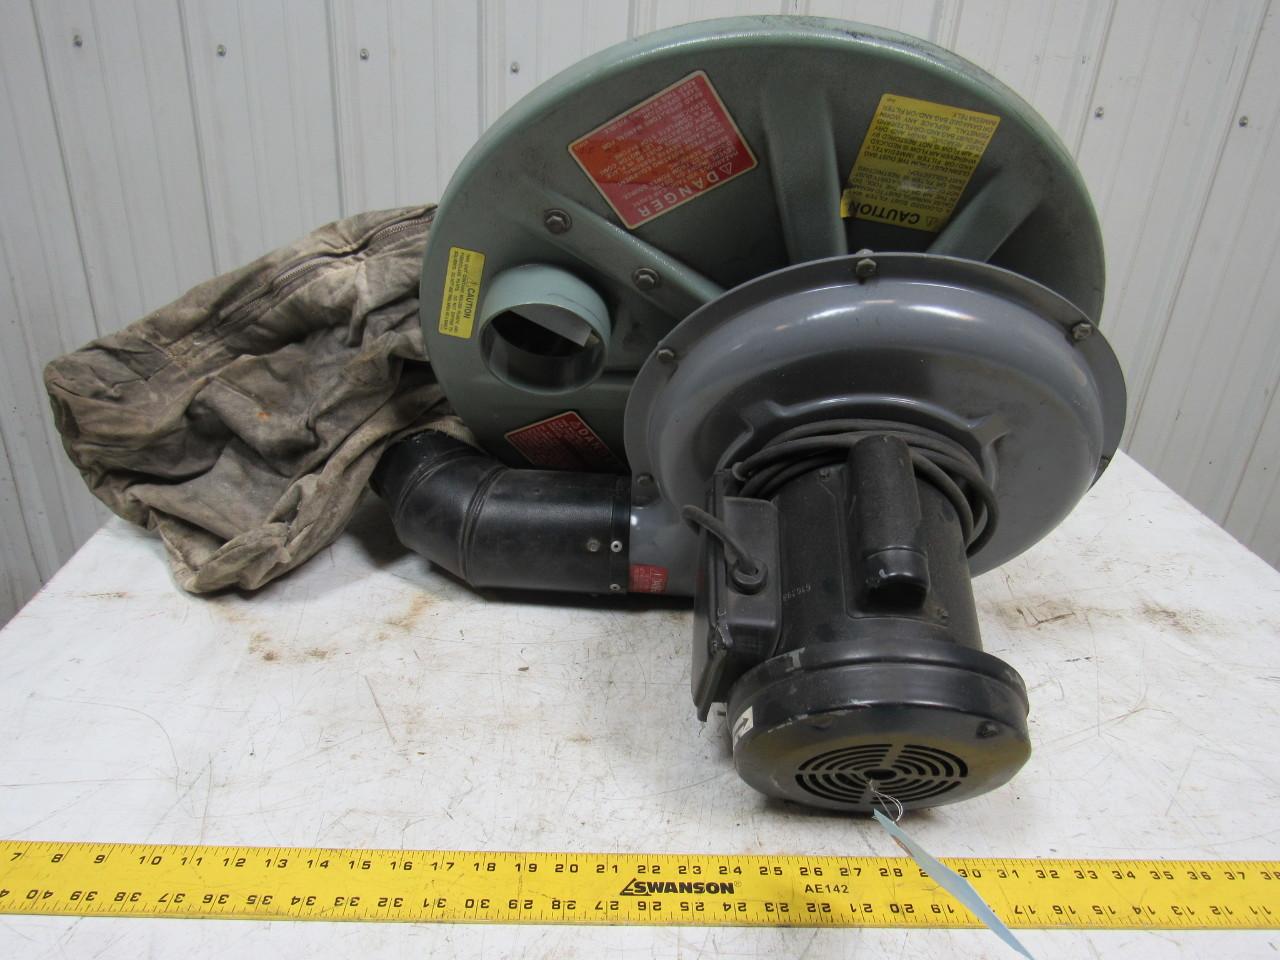 Cincinnati 1 z967 s50 1 2hp dust collector 55 gallon drum for Dust collector motor blower